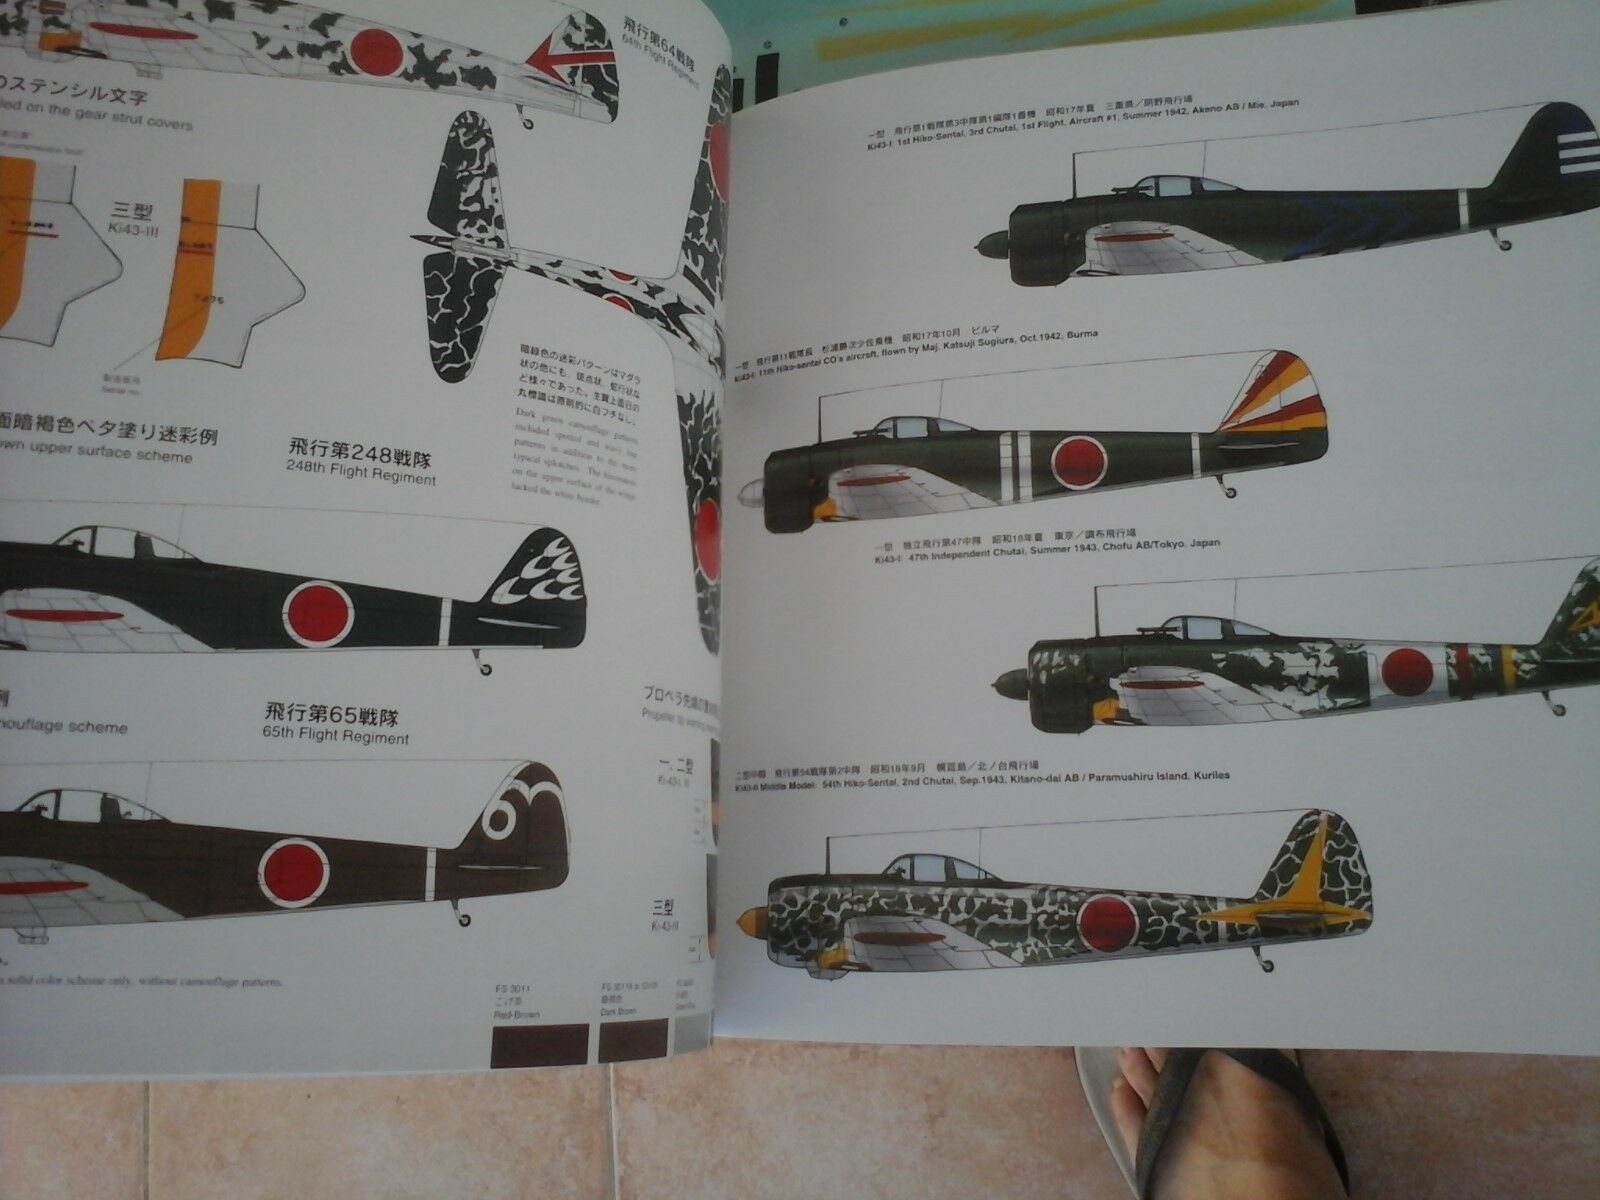 AERO DETAIL N.29 NAKAJIMA KI 43II 43II 43II HAYABUSA  OSCAR  -BY SHIGERU NOHARA-MODEL GRAP 212a50